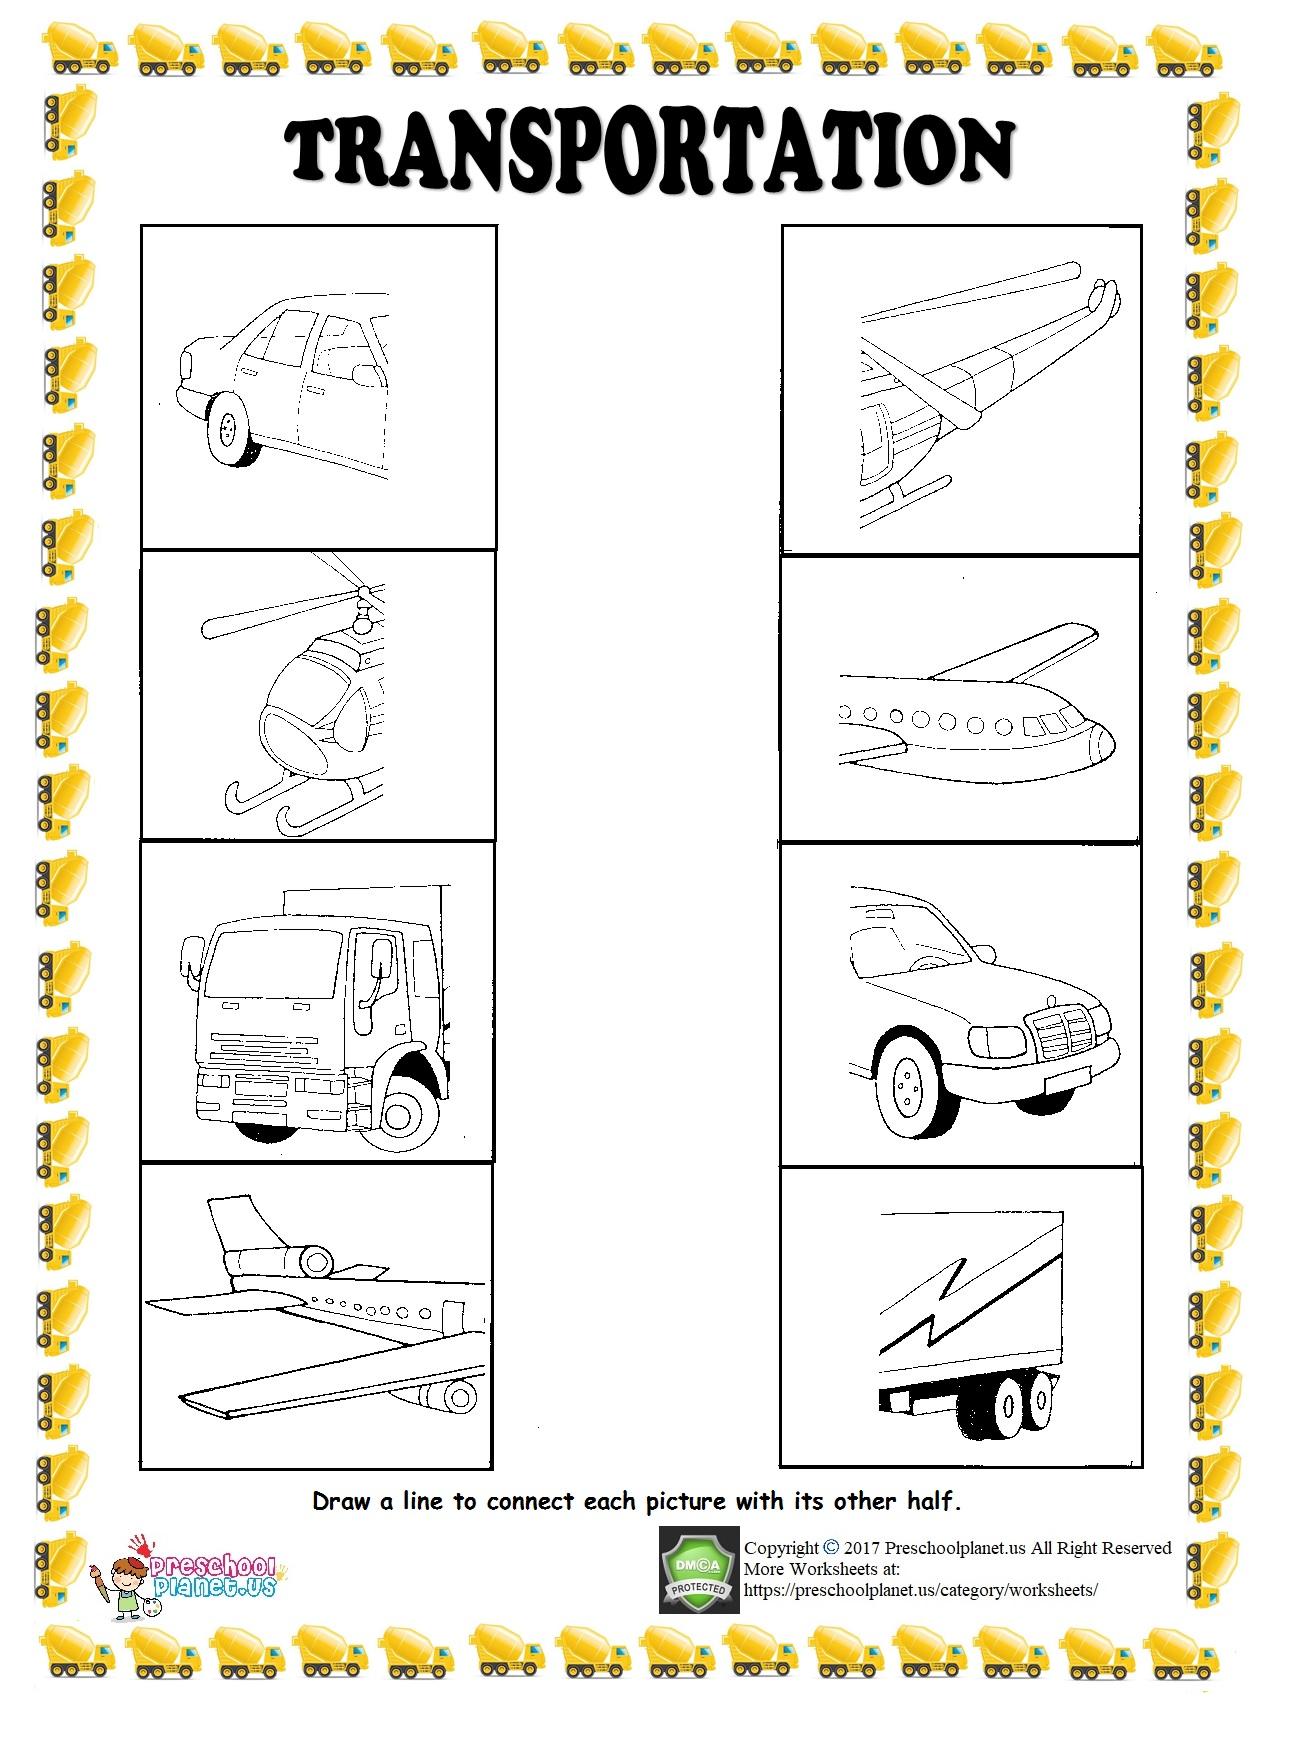 Ship Trace Worksheet Preschoolplanet